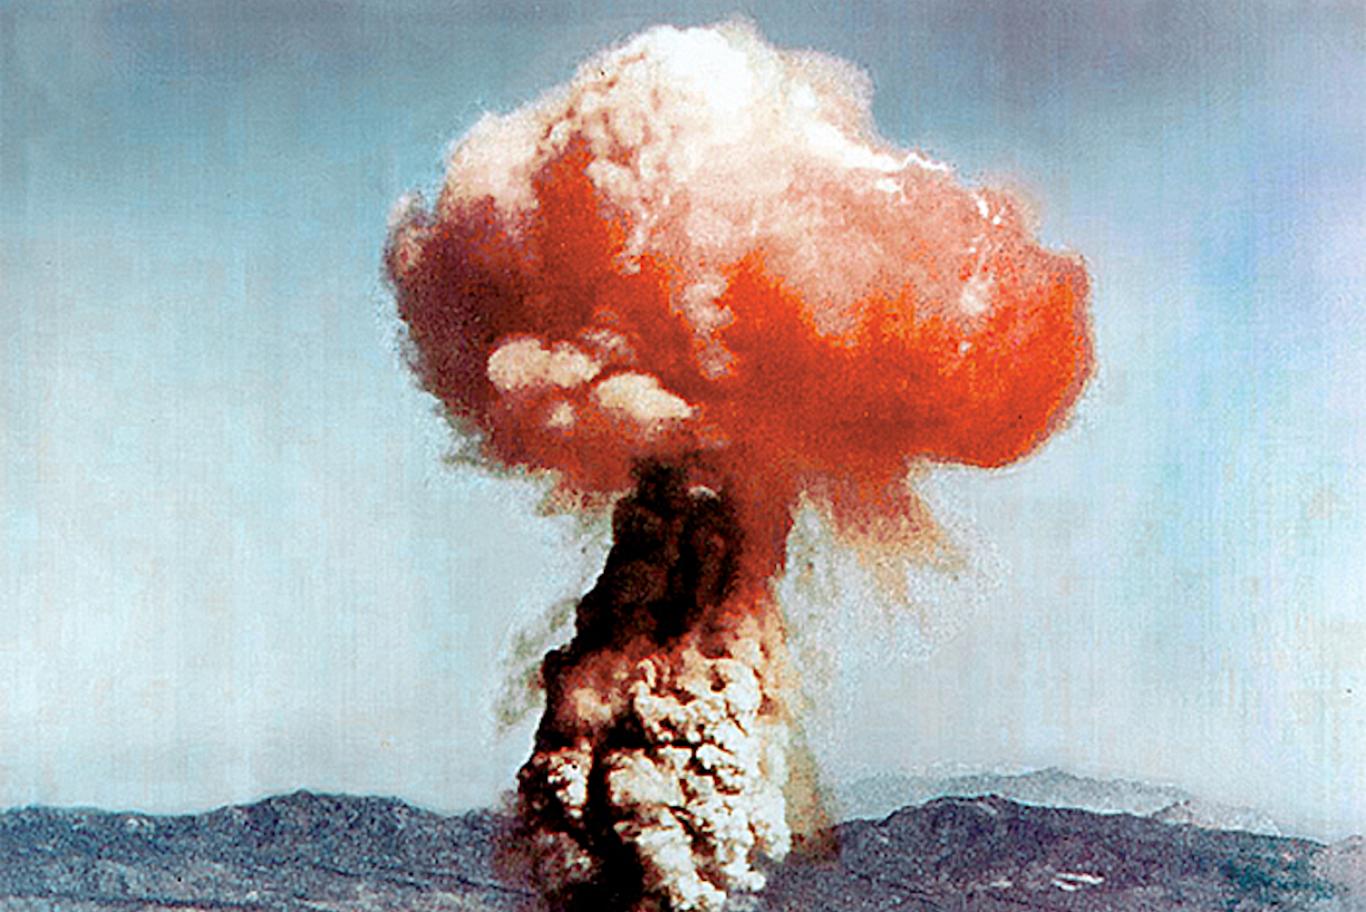 atomic_blast_nevada_yucca_1951_better_quality